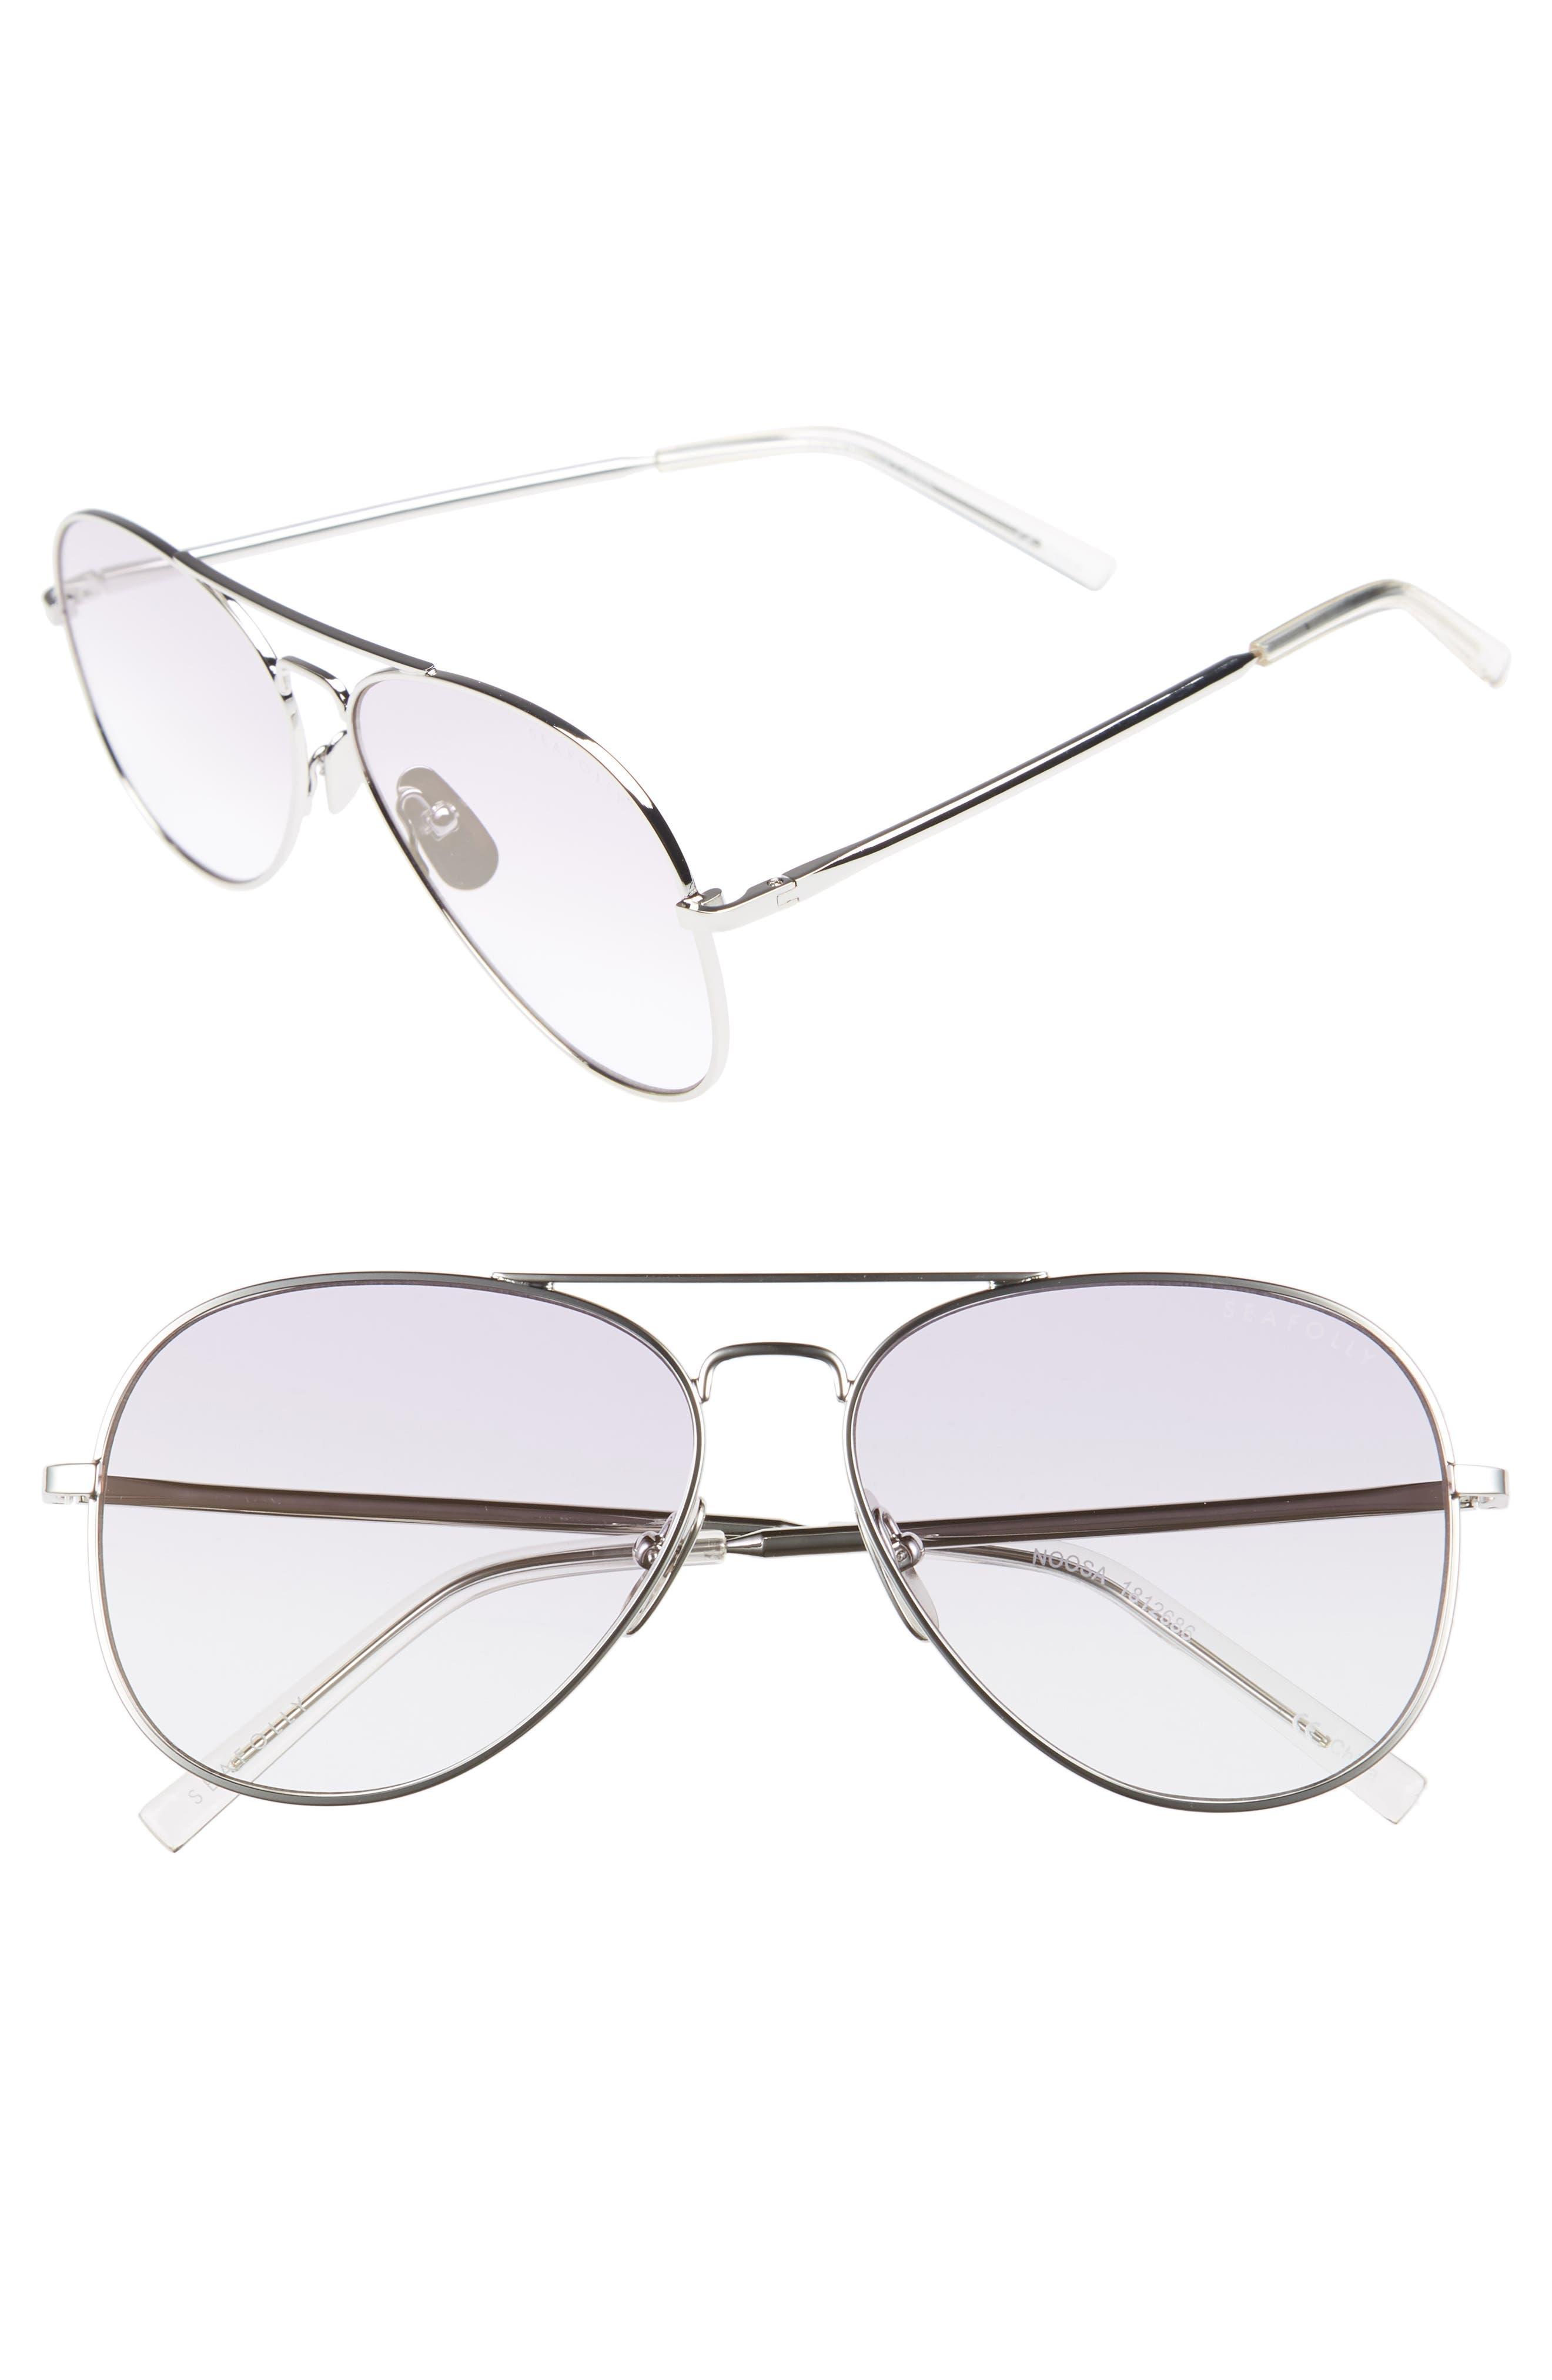 Noosa 55mm Metal Aviator Sunglasses,                             Main thumbnail 1, color,                             SILVER